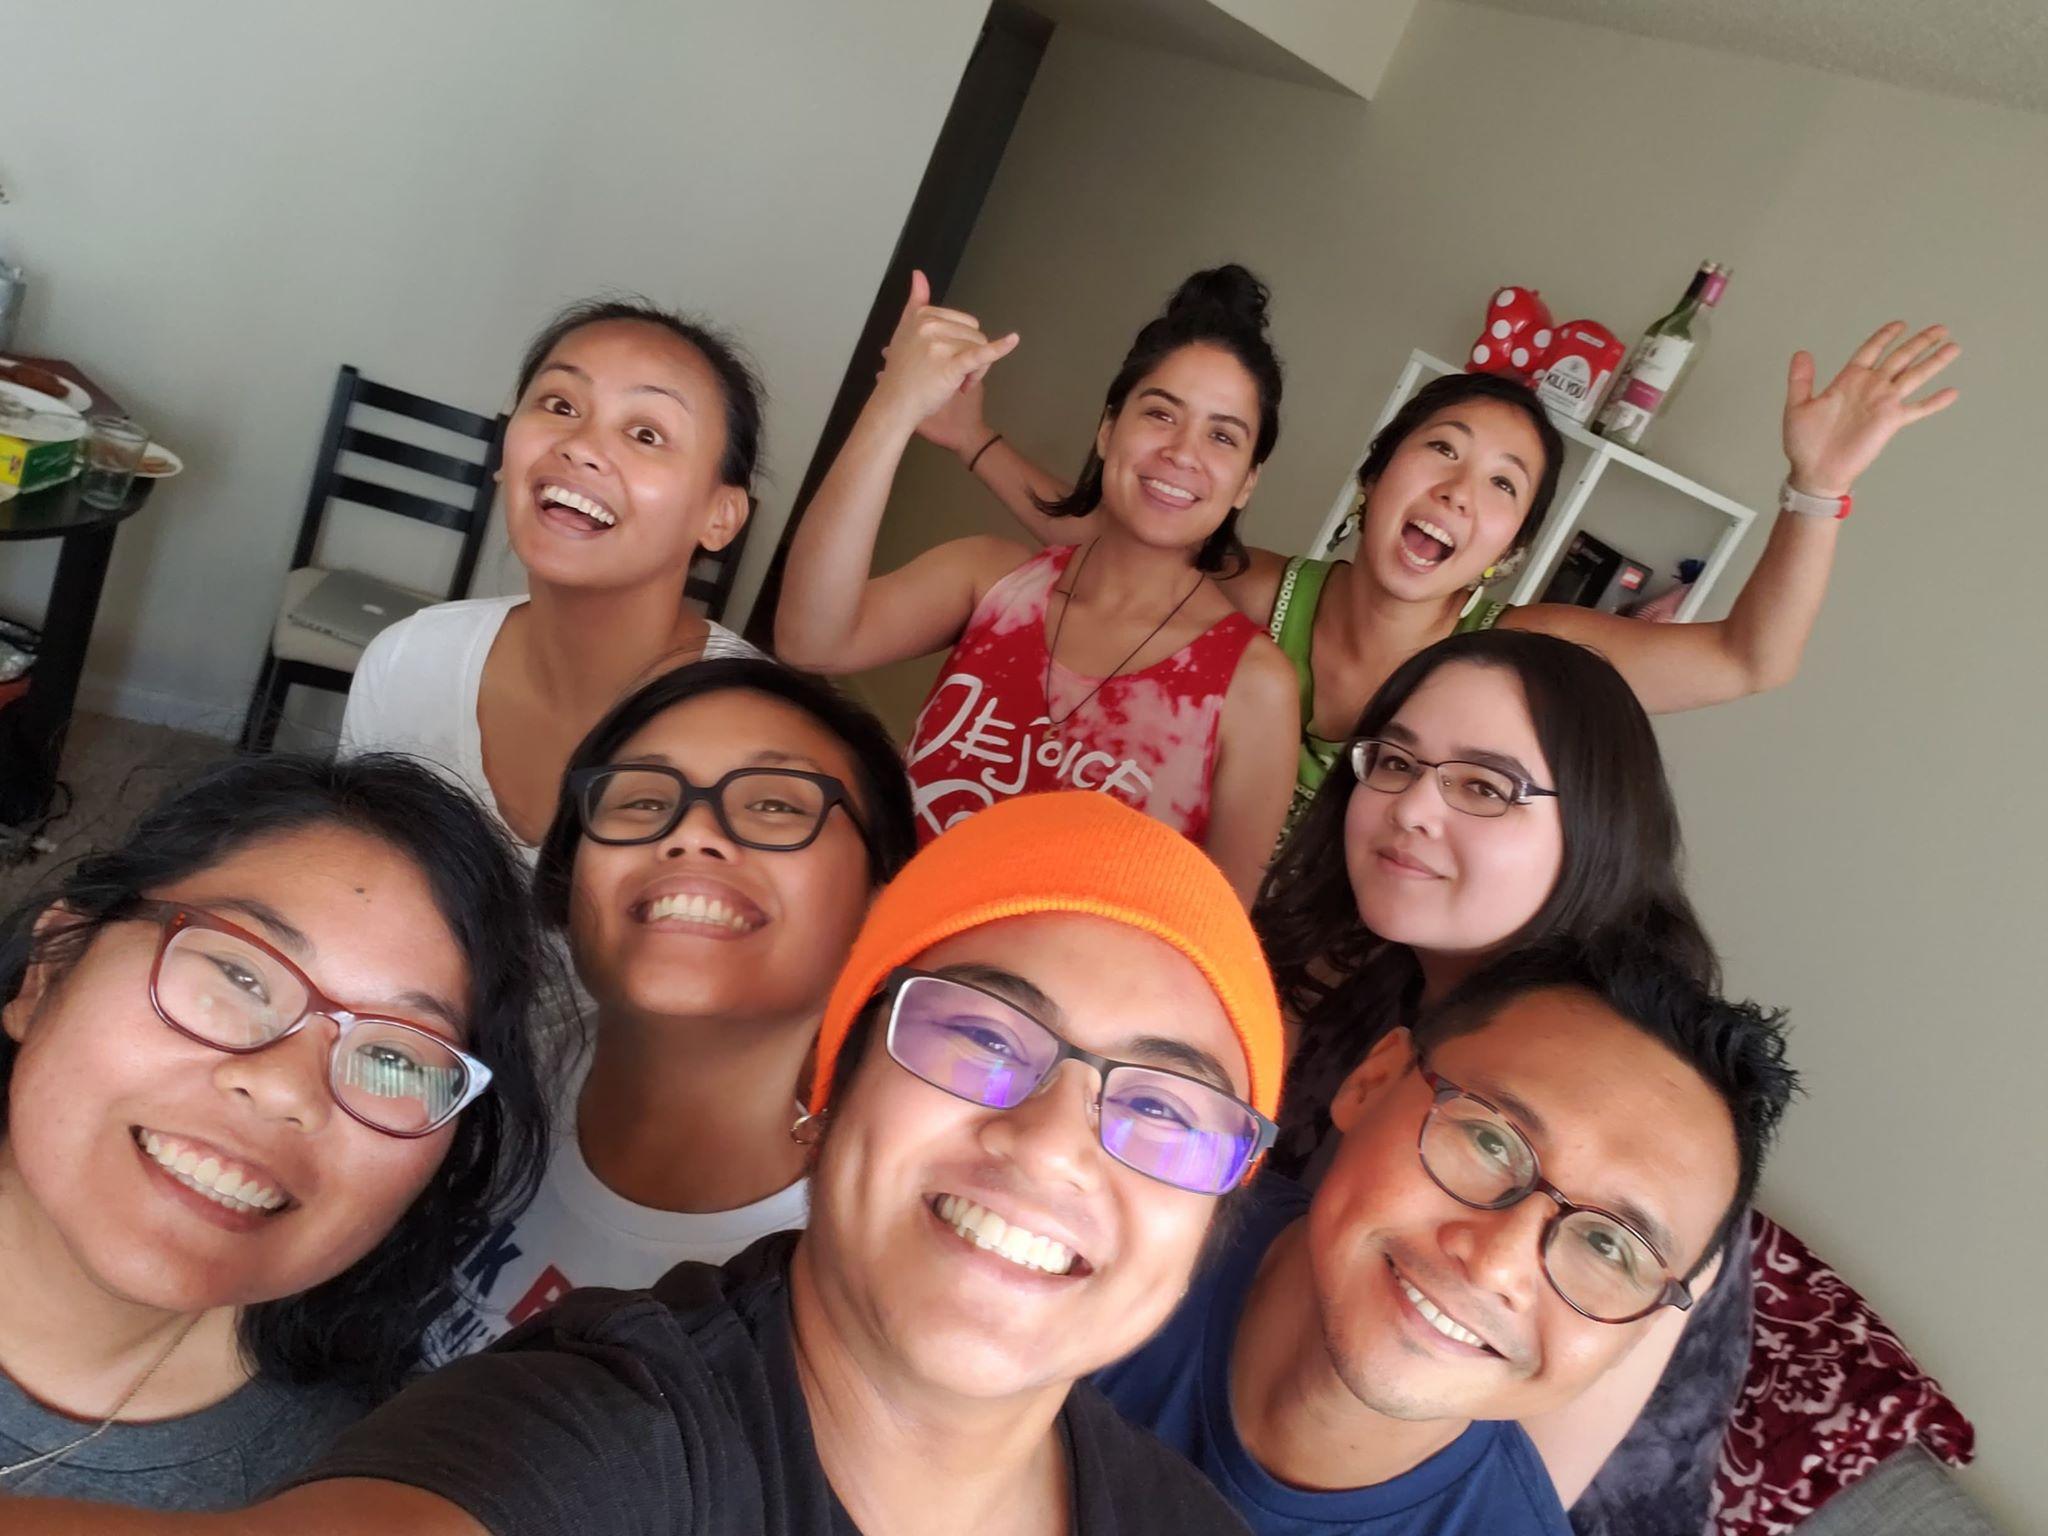 Baltimore Asian Pasifika Arts Collective core staff: (Top L-R) Donna Ibale, Mani Yangilmau, Mika Nakano, Sam Callanta; (Bottom L-R) Marela Kay Minosa, Cori Dioquino, Catrece Tipon, Mohammad R. Suaidi.